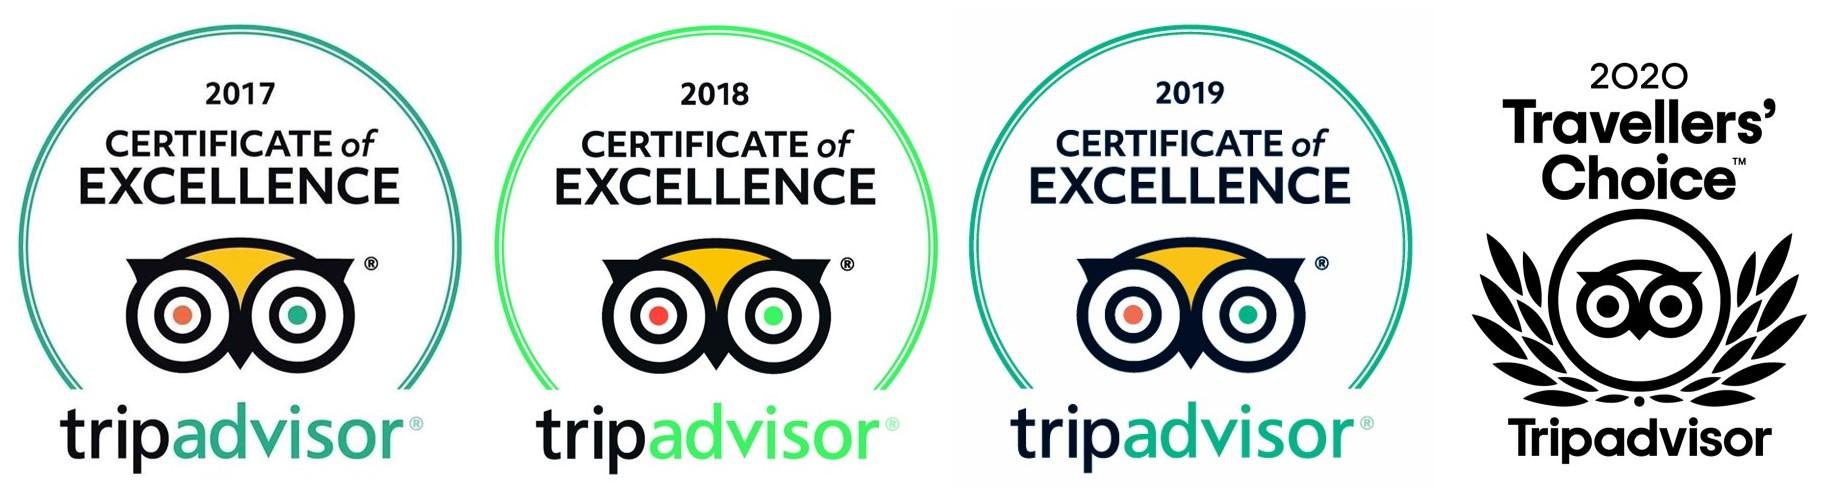 Tripadvisor Awards